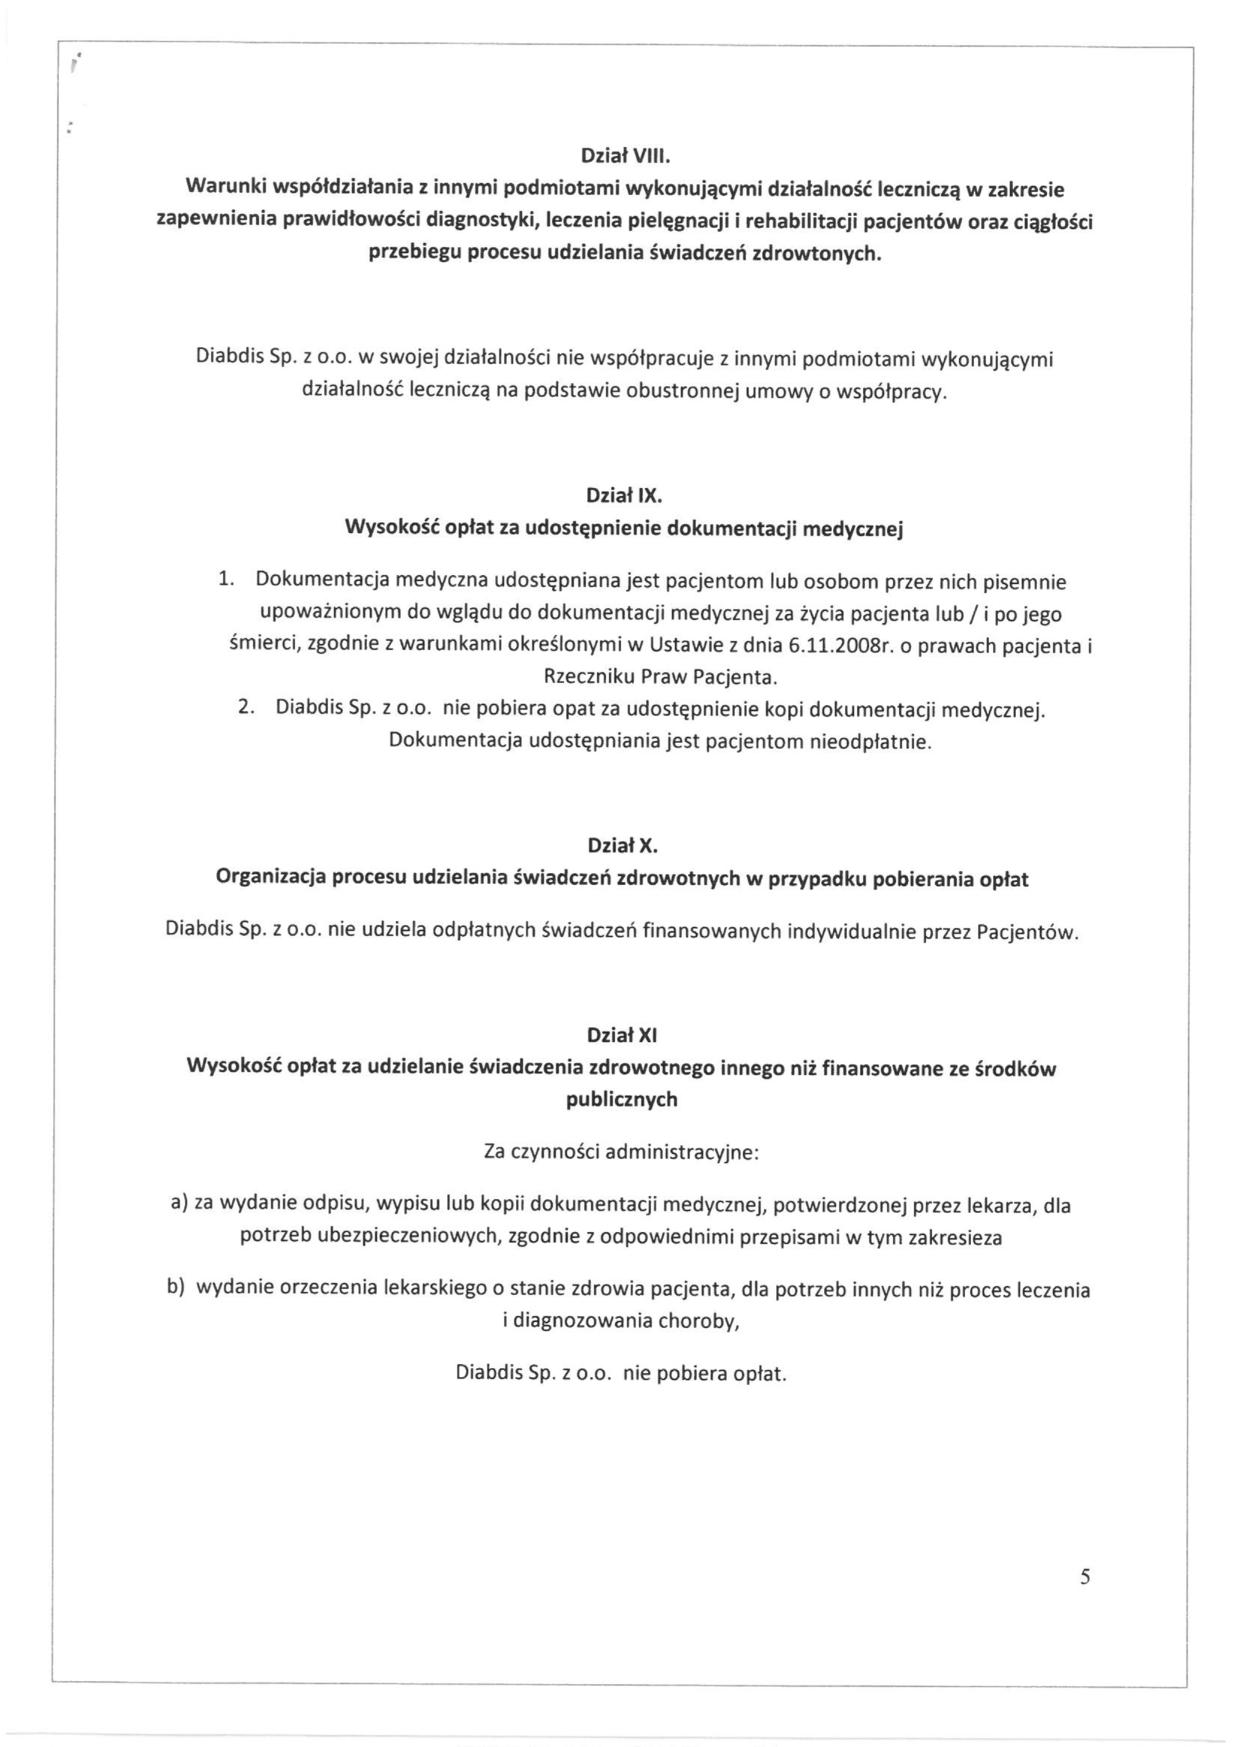 Regulamin organizacyjny, strona 5